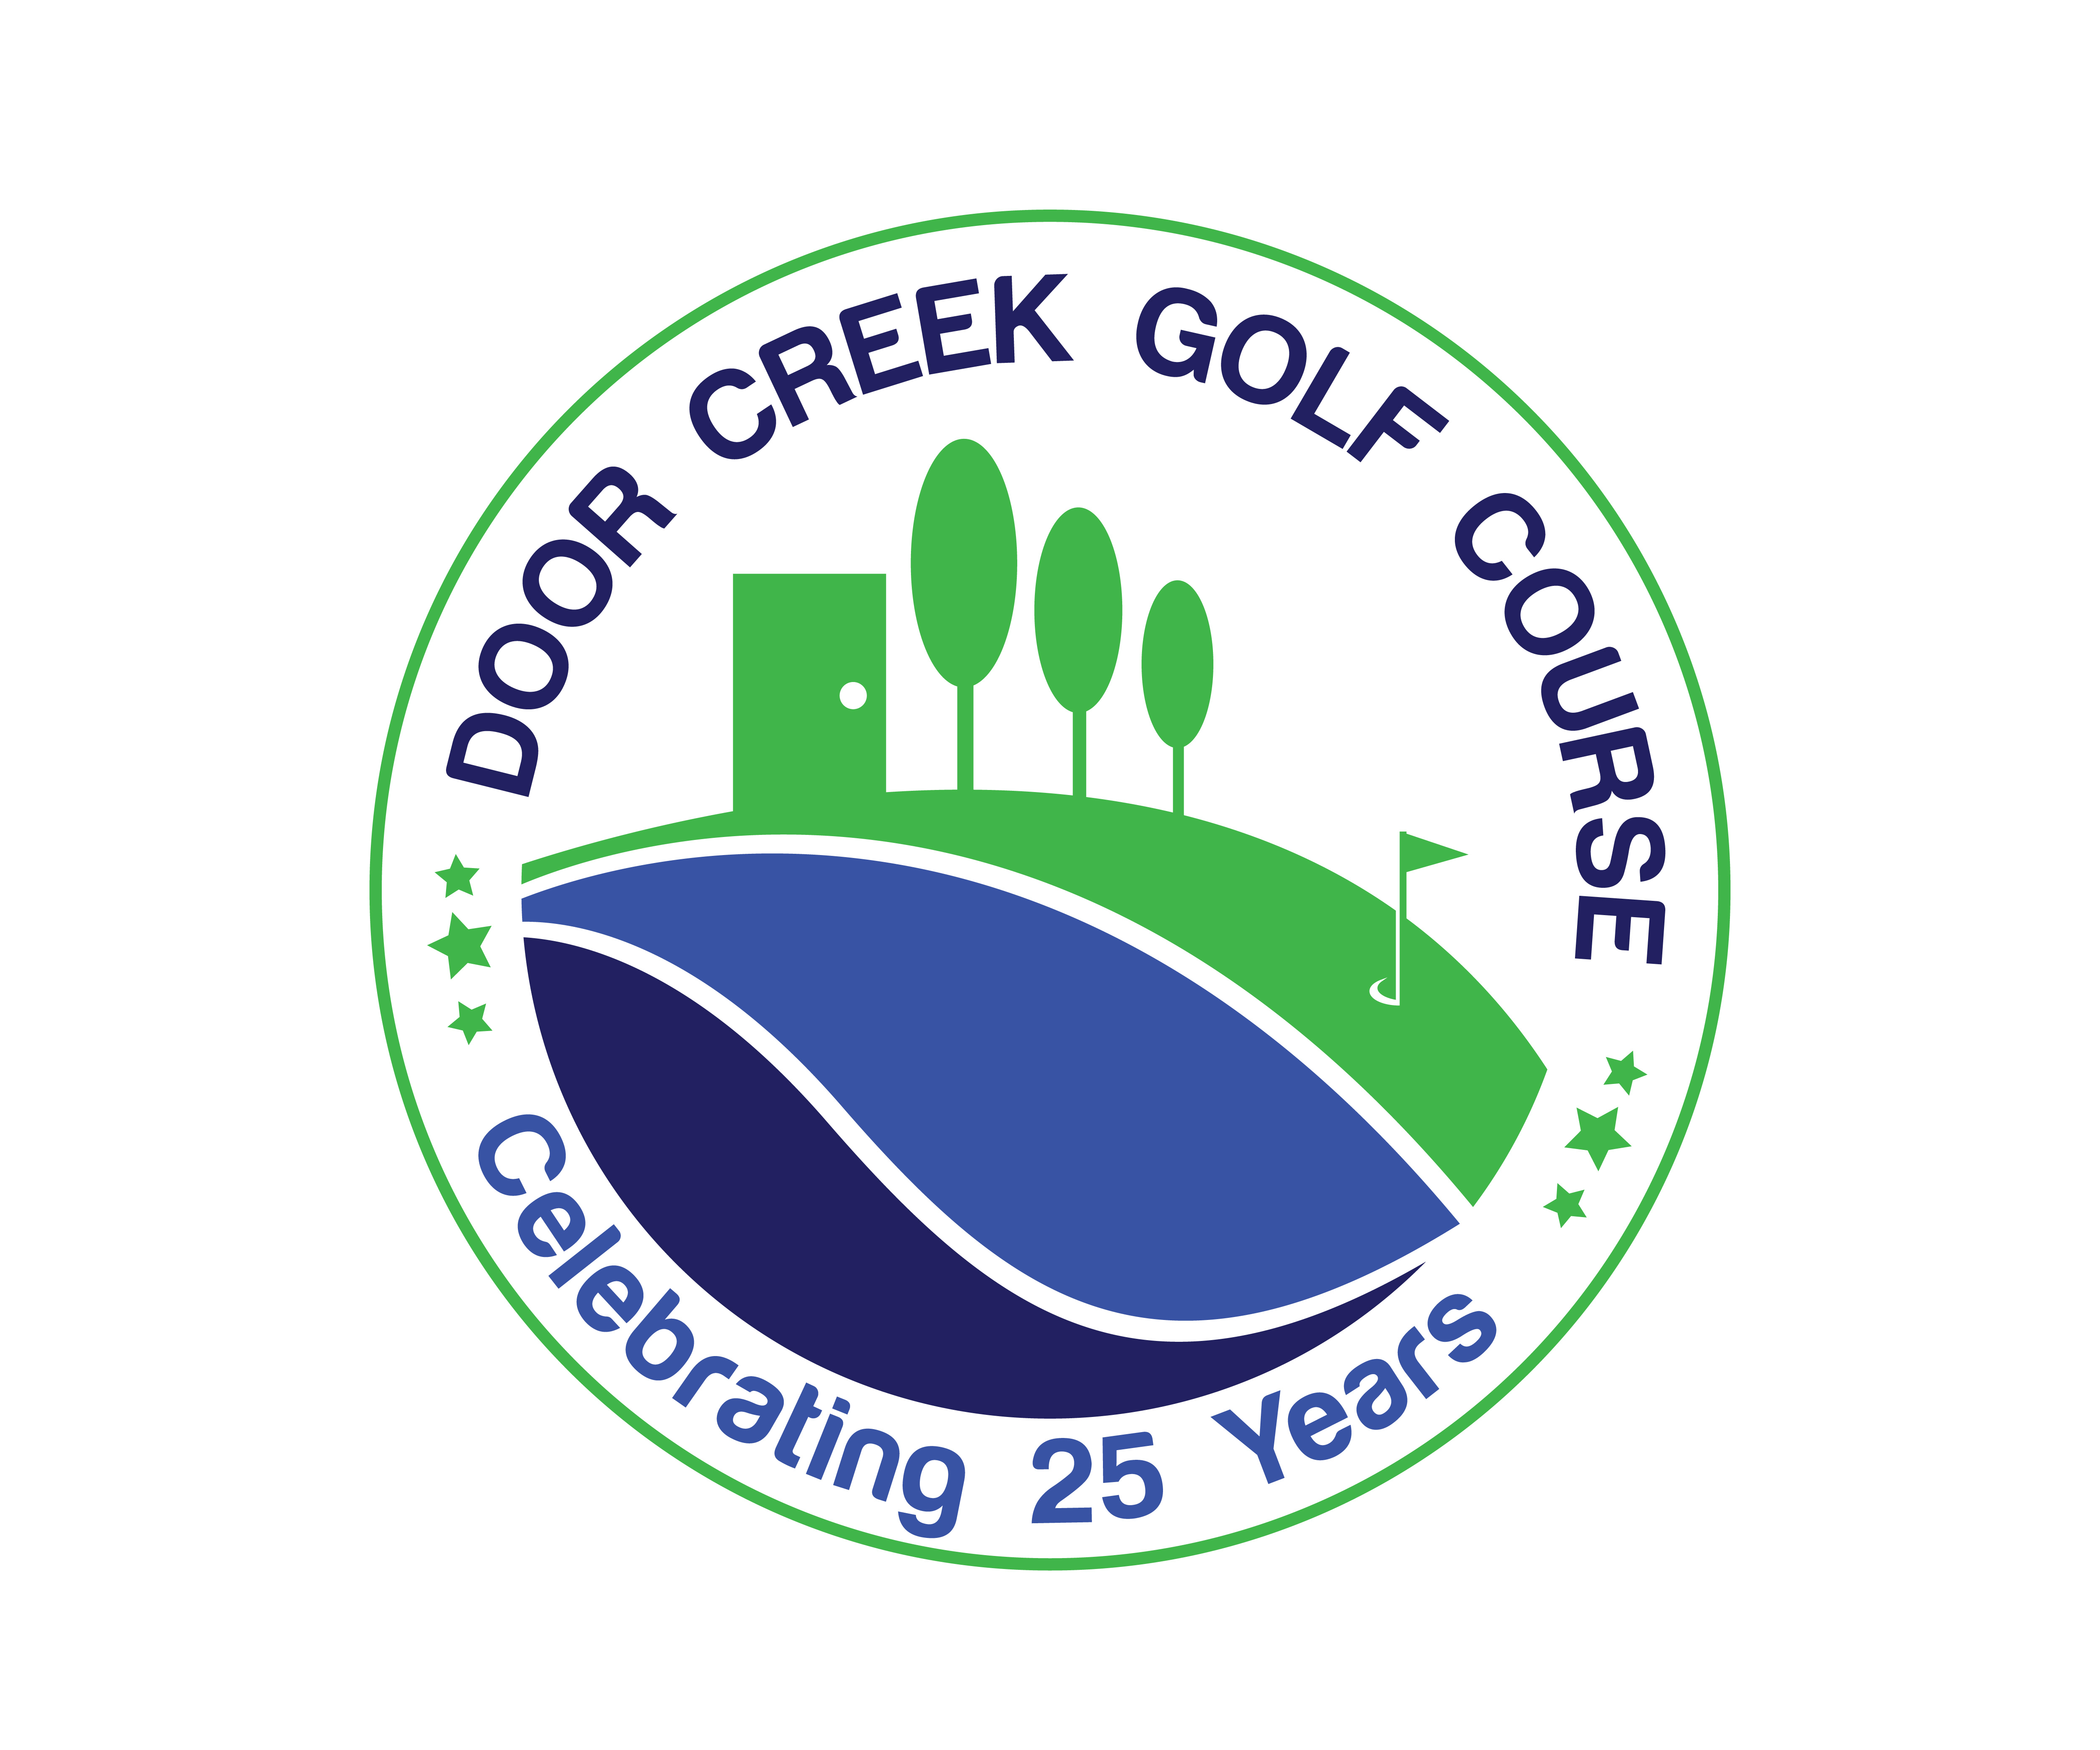 Playful Personable Logo Design For Door Creek Golf Course